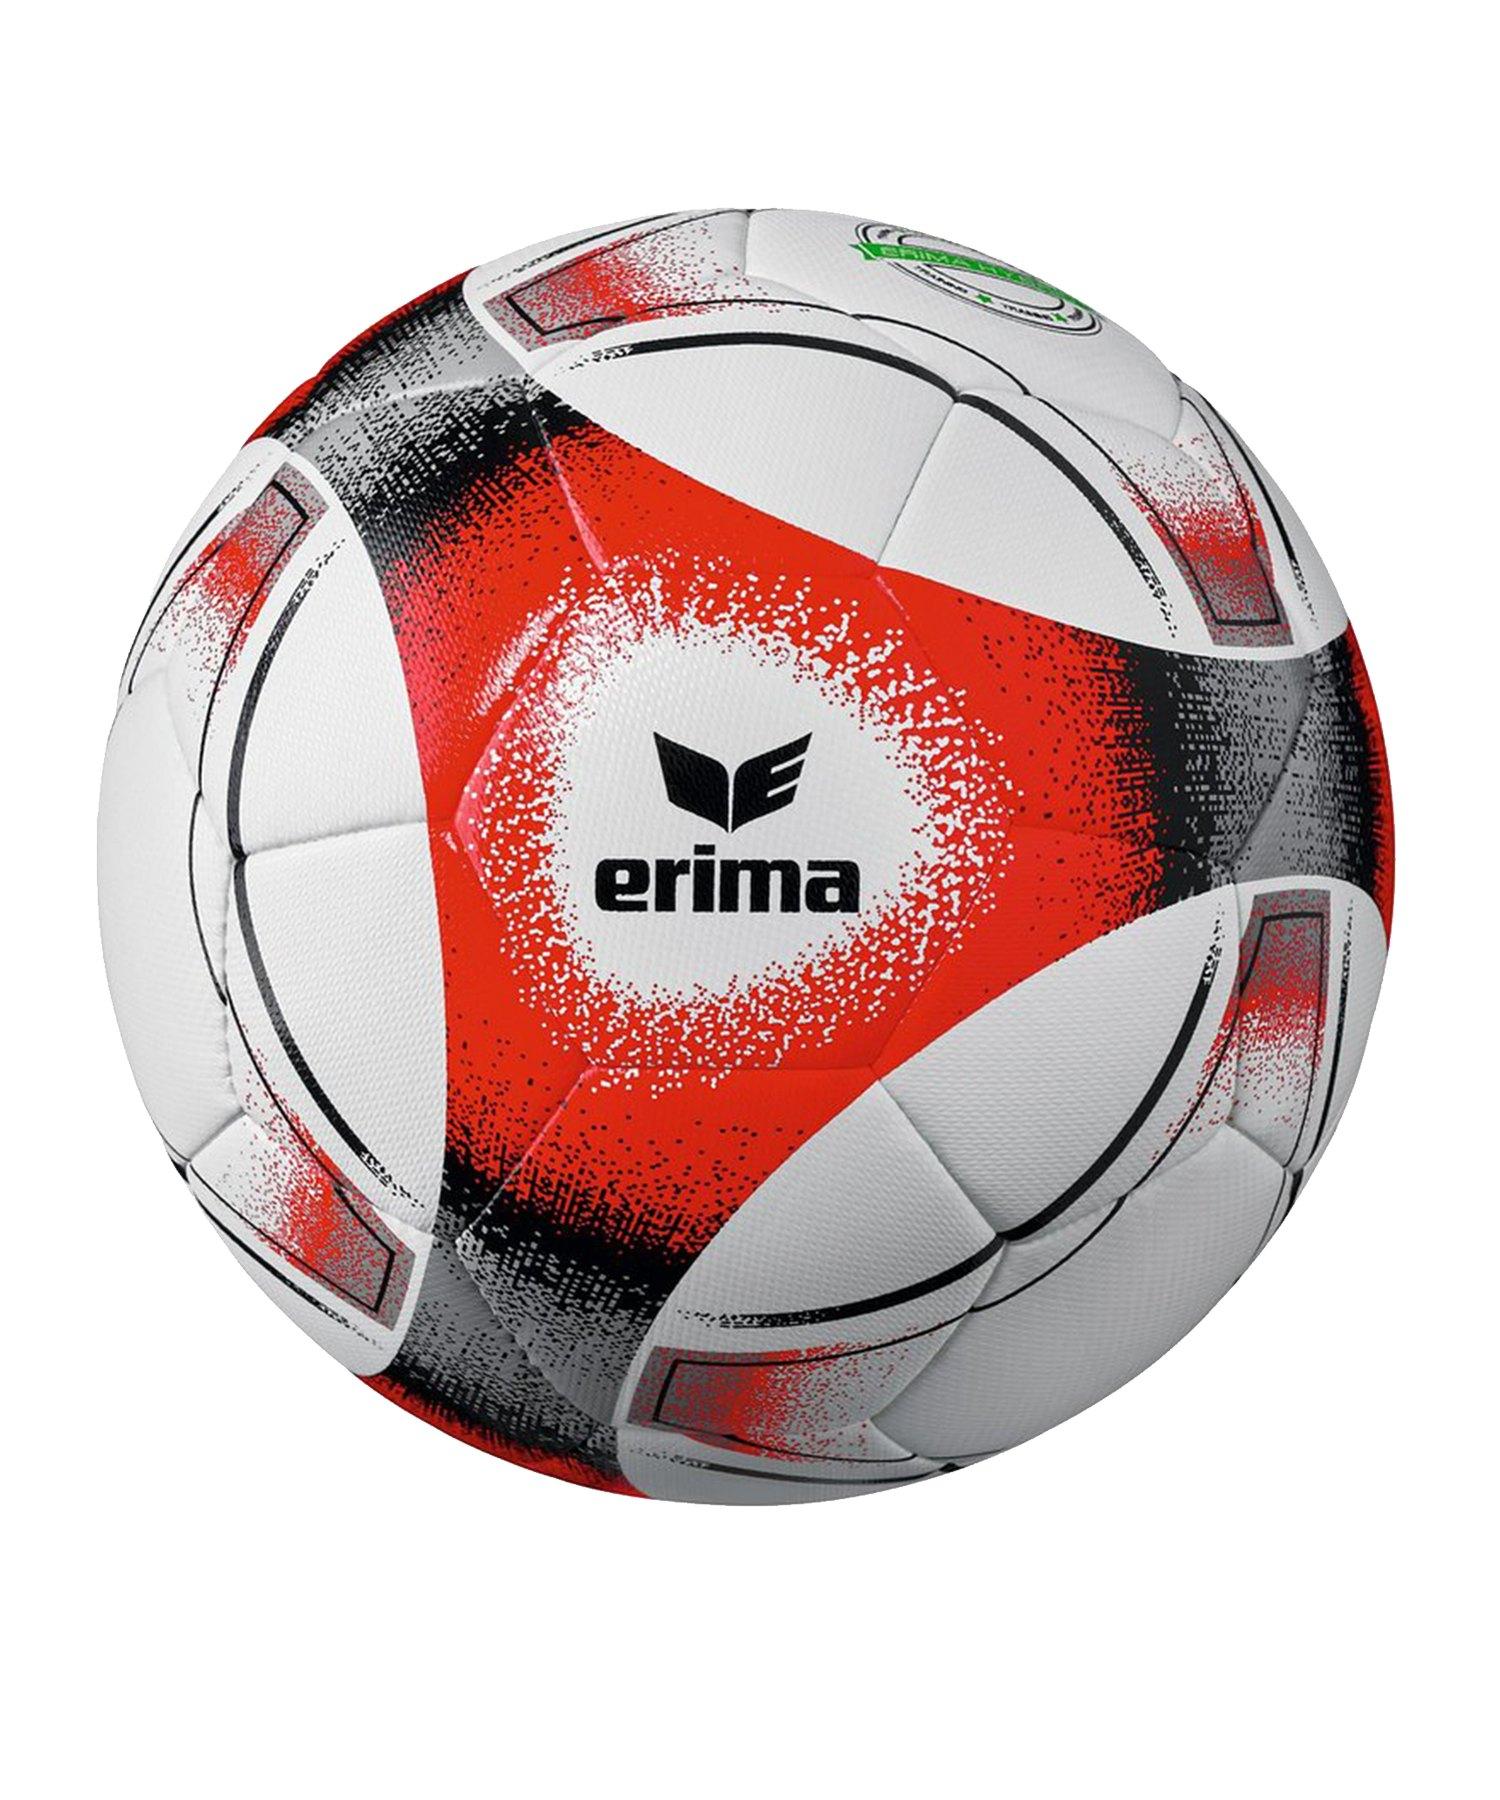 Erima Hybrid Training Fussball Rot Schwarz - rot